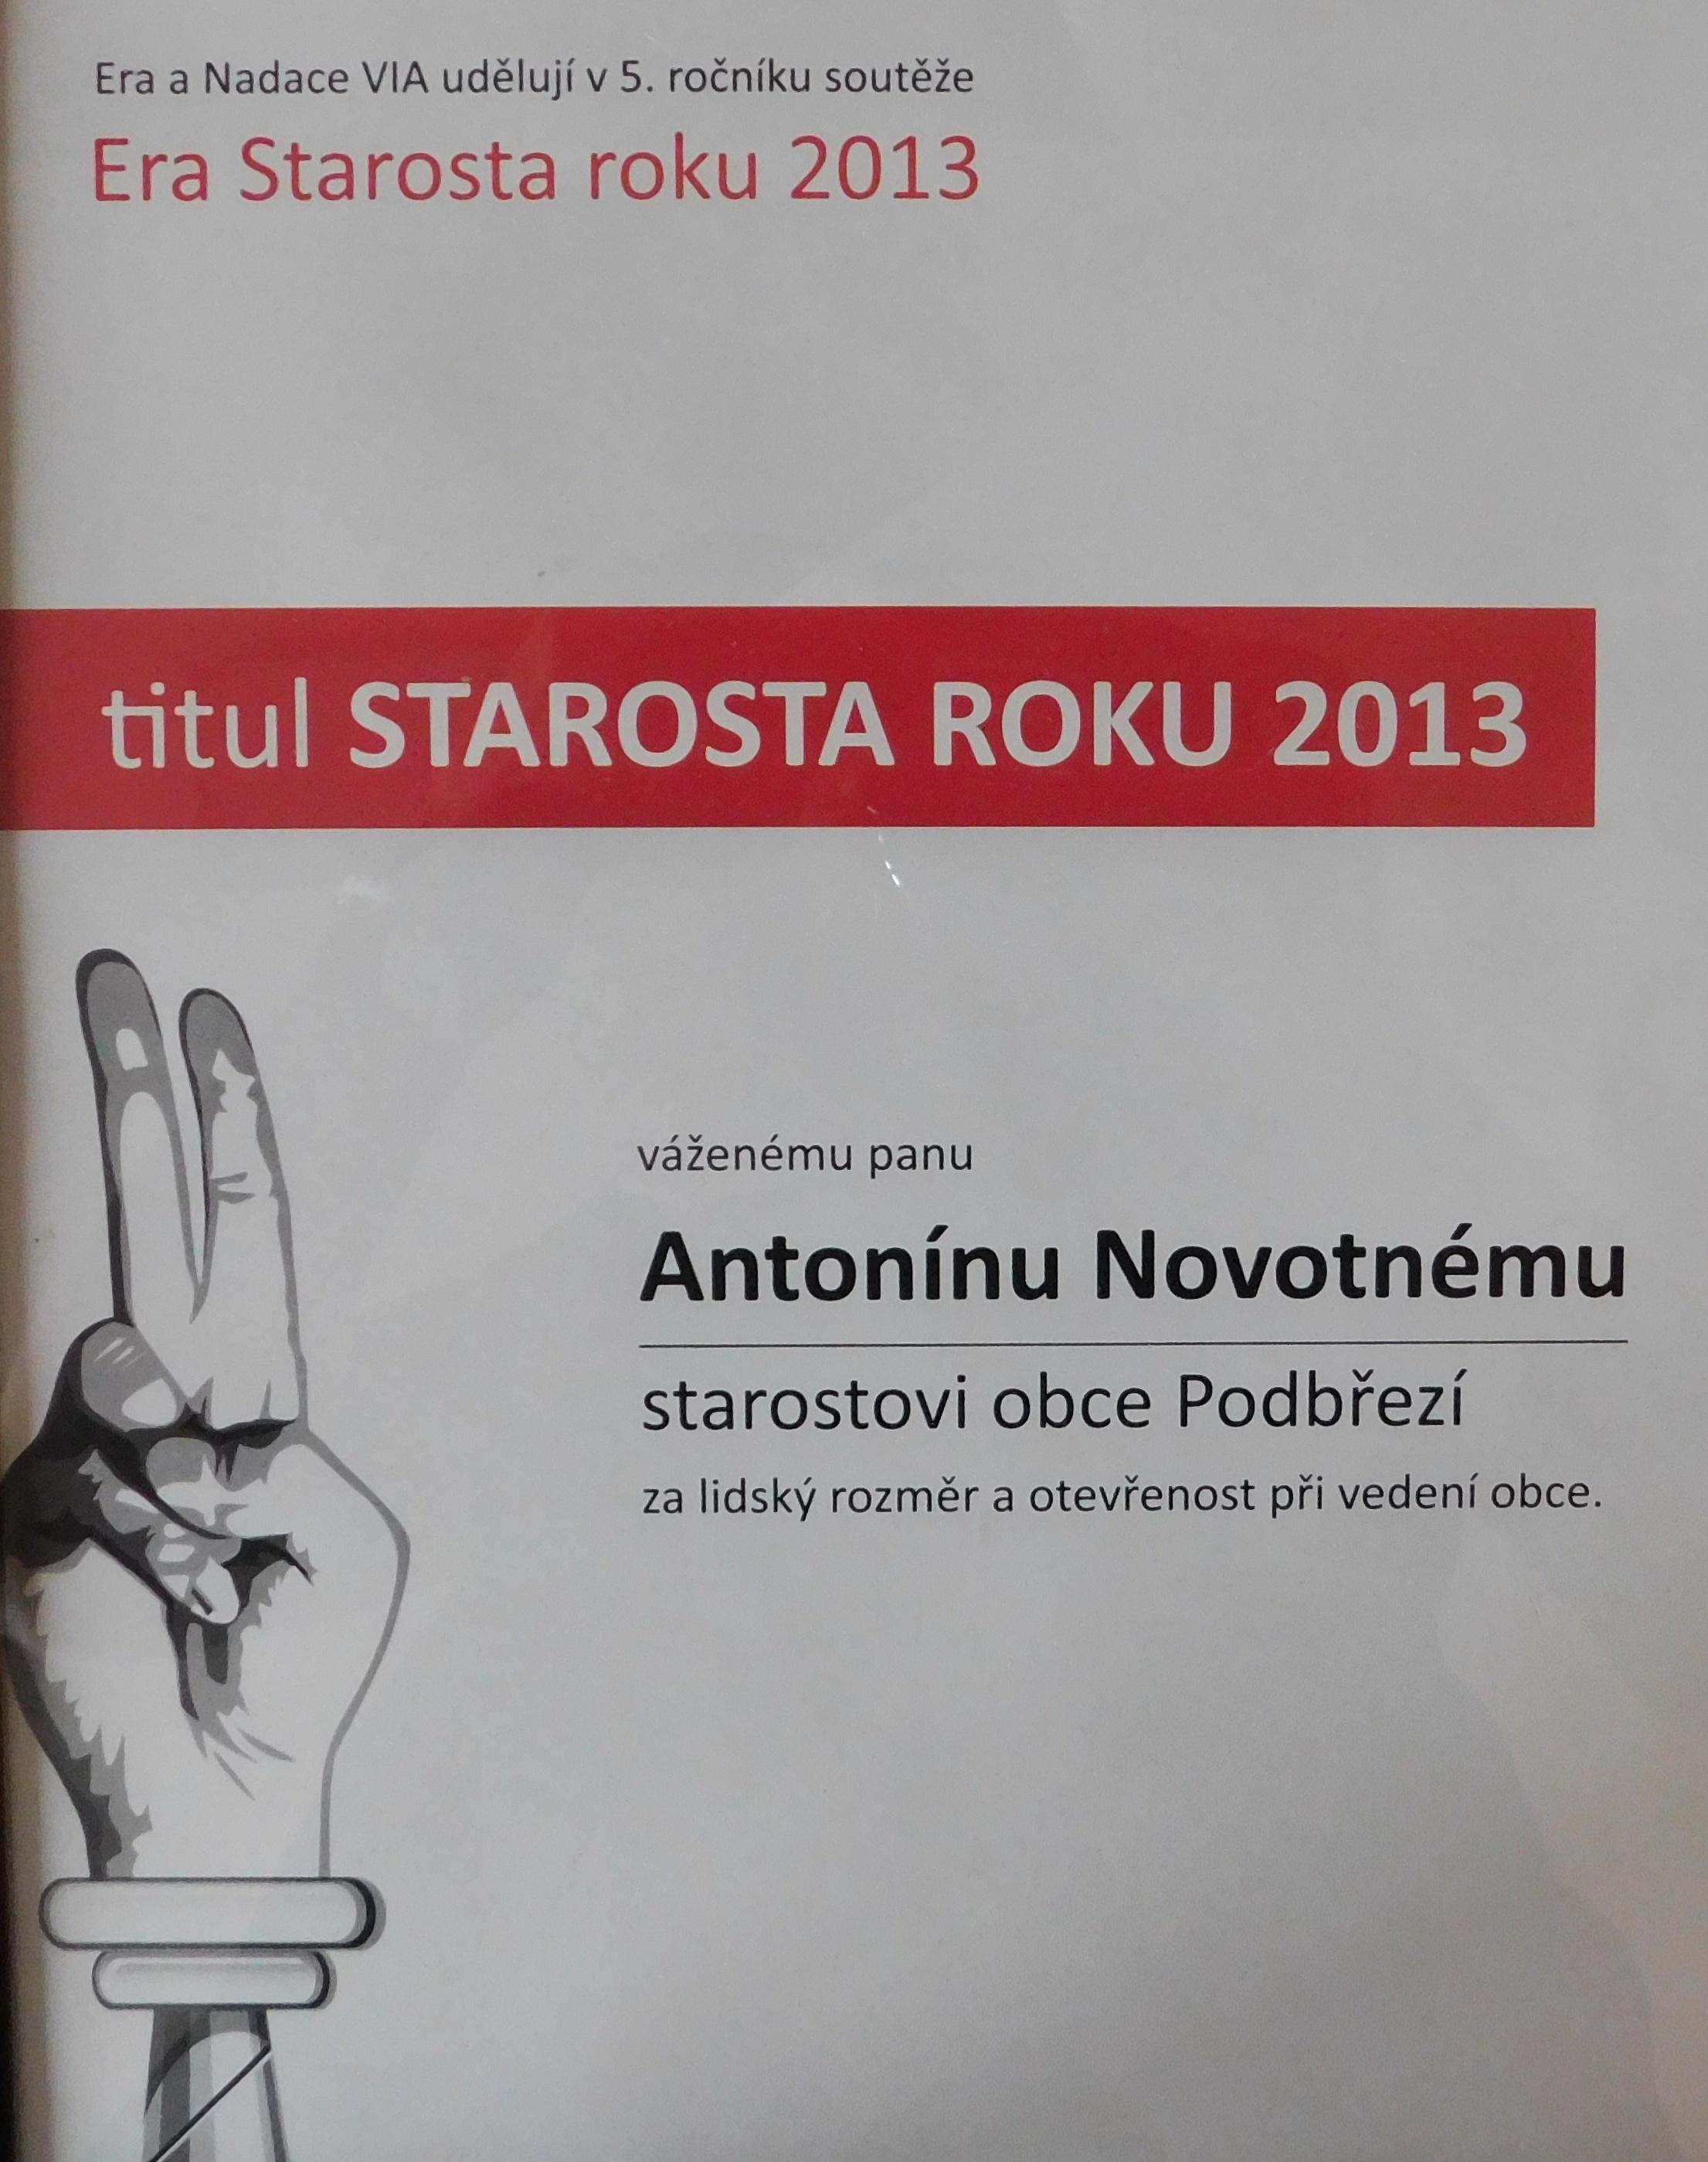 Diplom - Starosta roku 2013